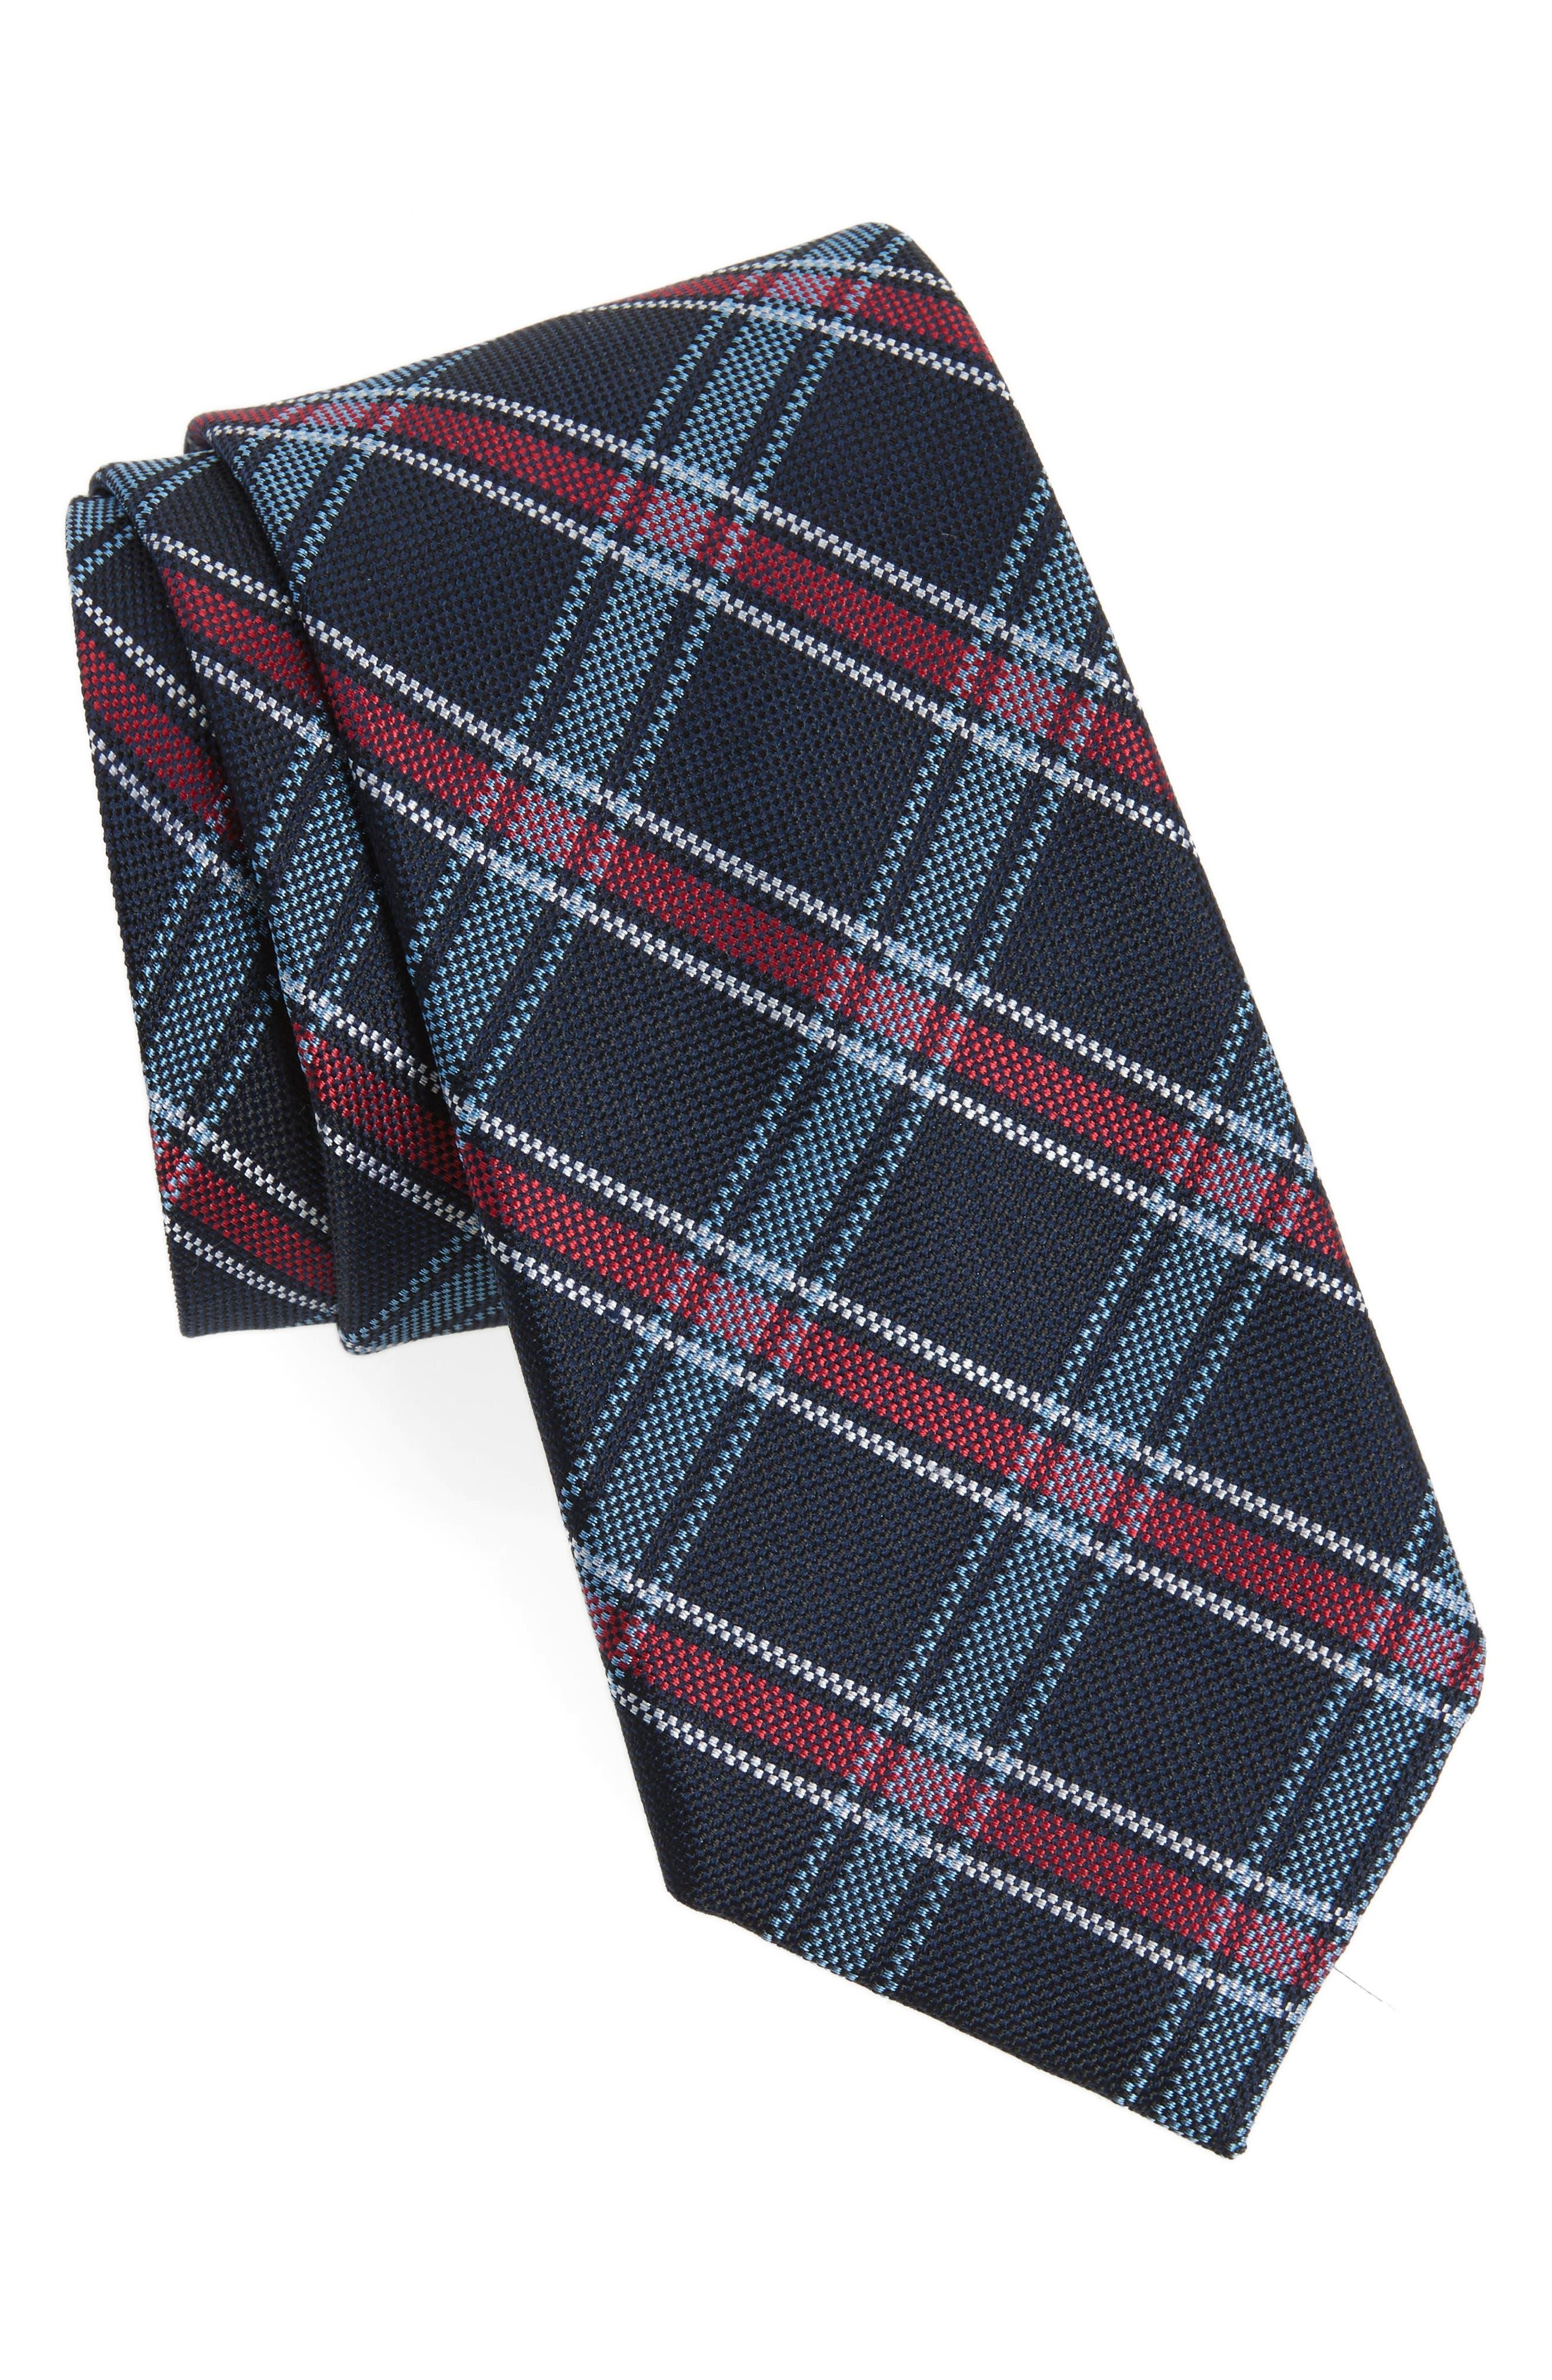 Alternate Image 1 Selected - Nordstrom Men's Shop Oxford Plaid Silk Tie